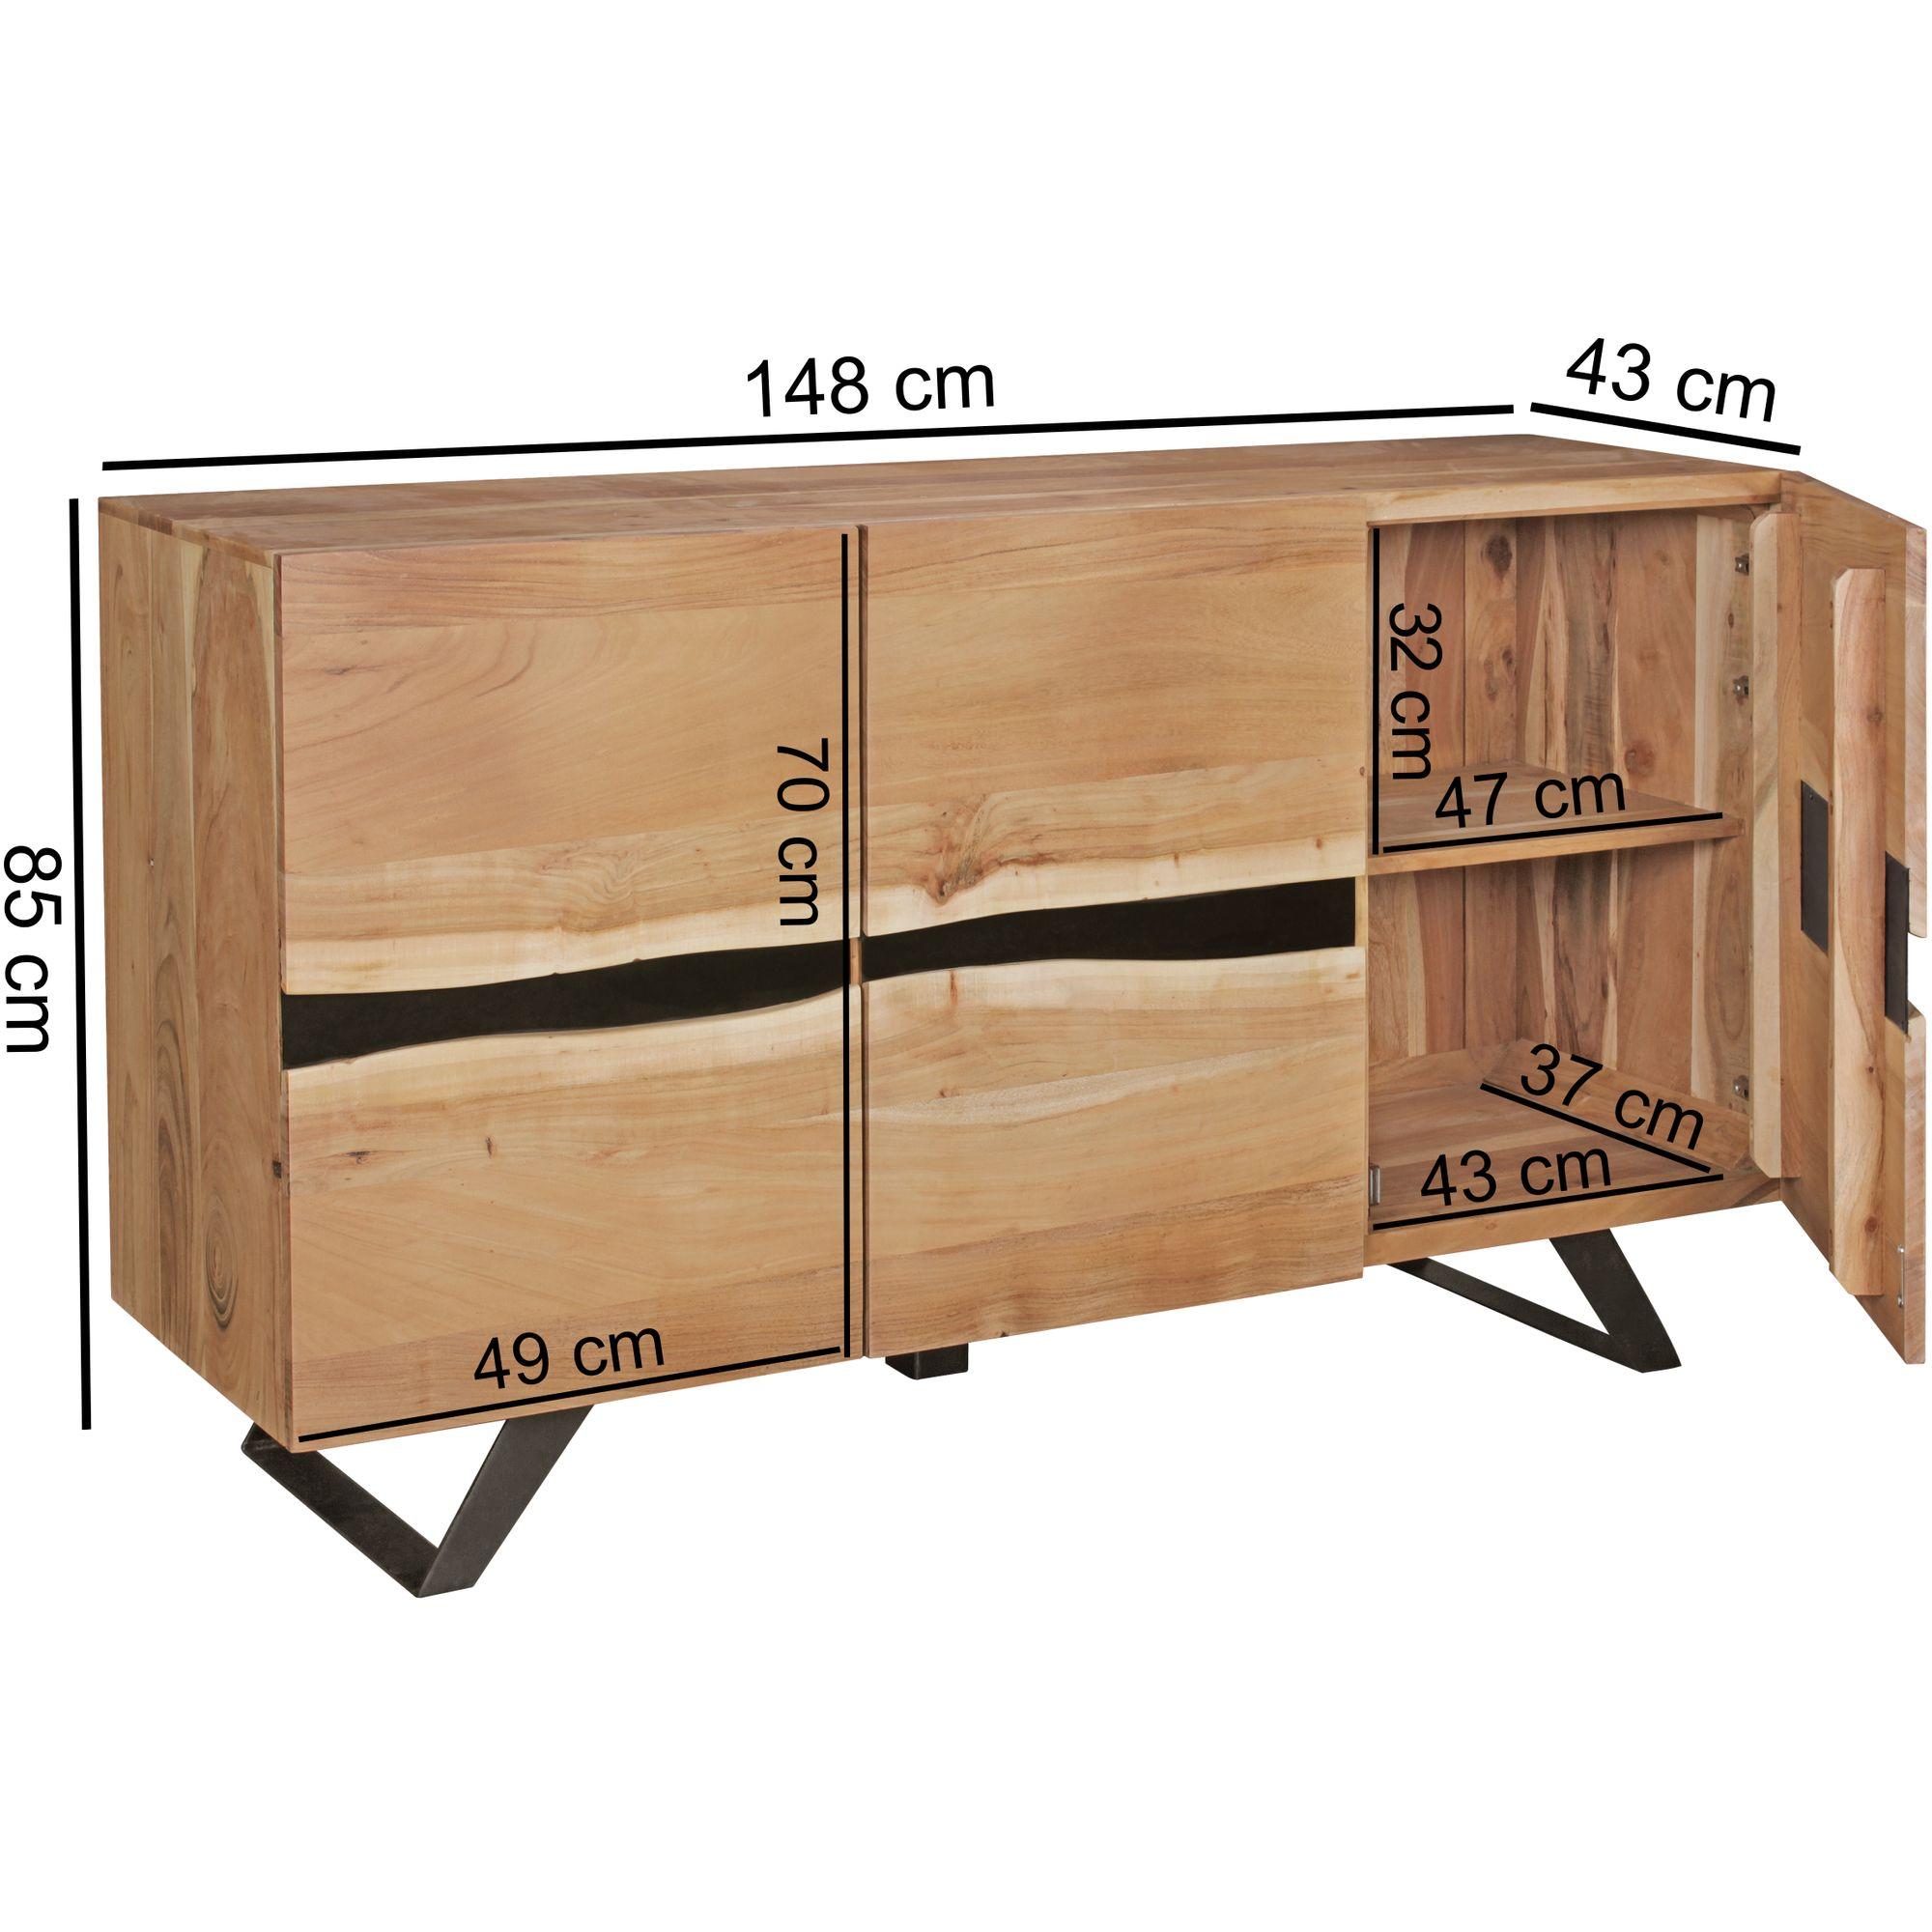 Sideboard Massivholz Akazie 150 Cm Anrichte Highboard Kommode